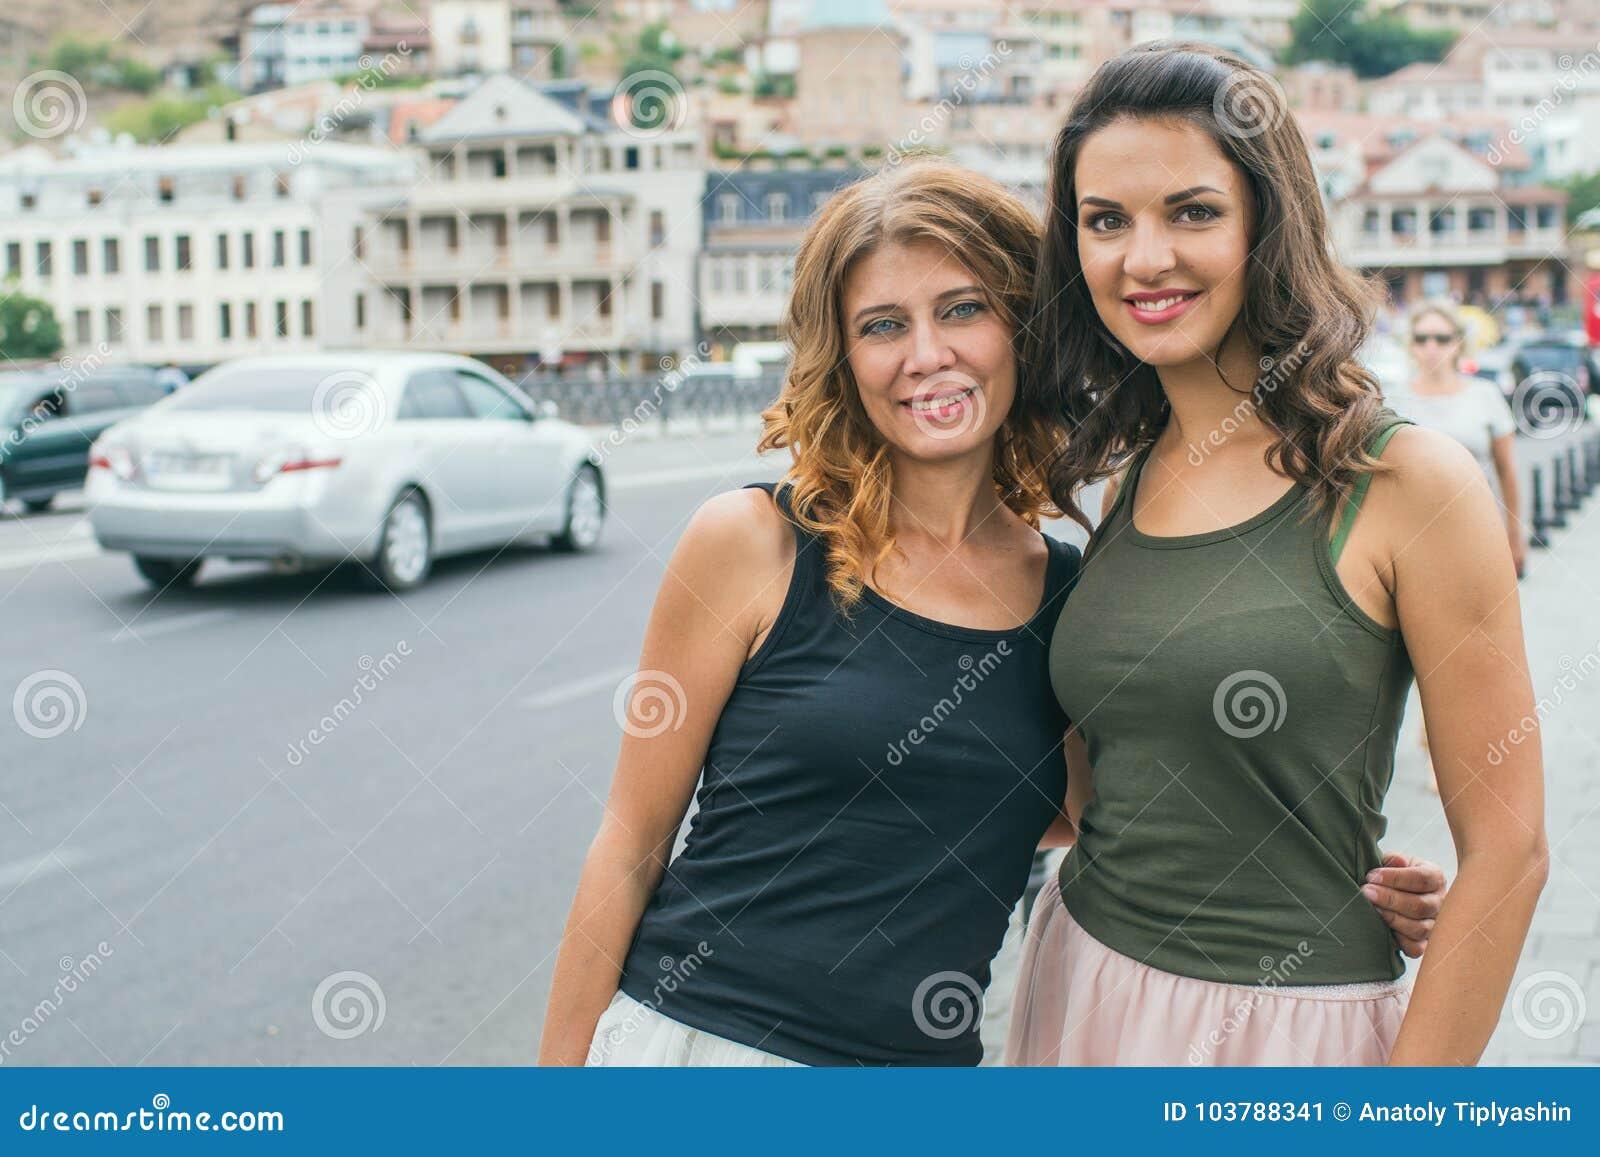 Not know. Beautiful georgia women You will